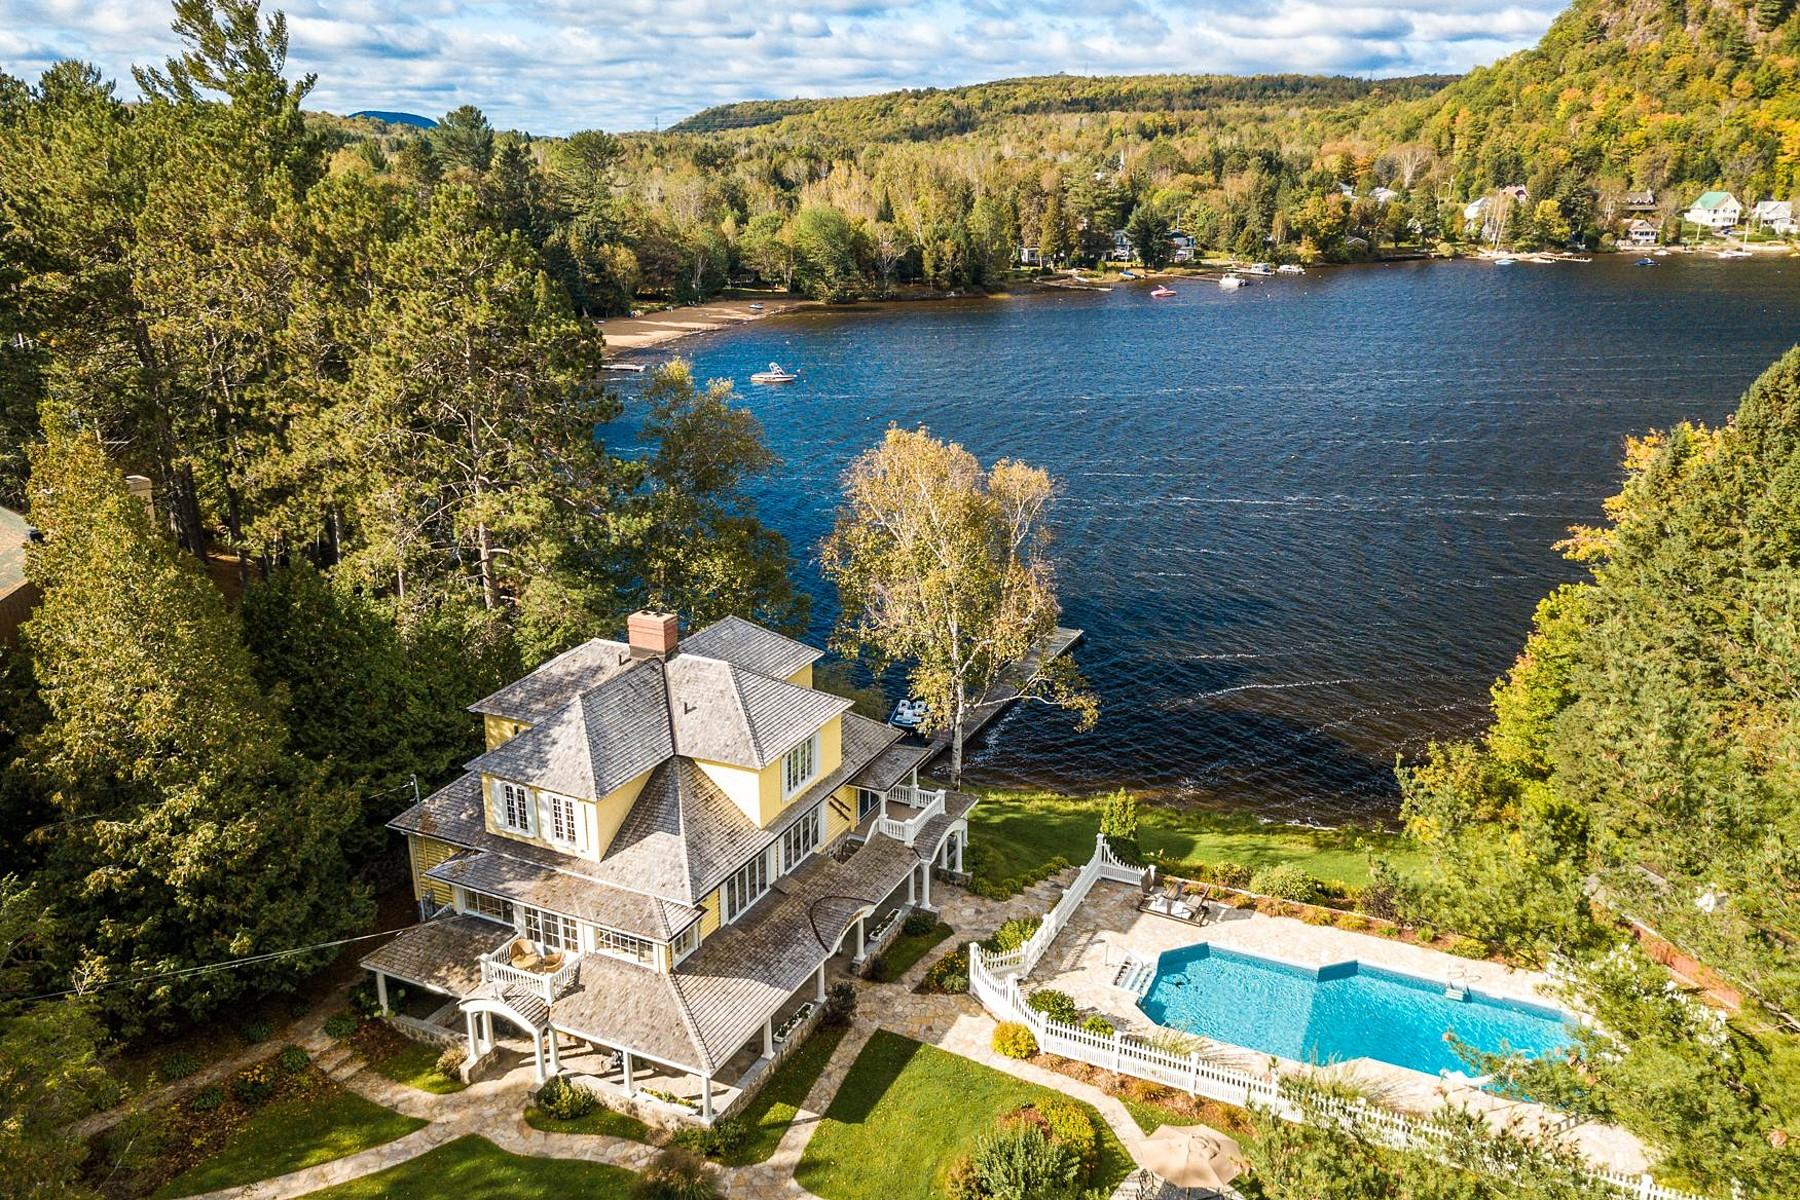 Single Family Home for Sale at 112 Av des Pins 112 Av. des Pins, Saint-Jean-De-Matha, Quebec, J0K2S0 Canada